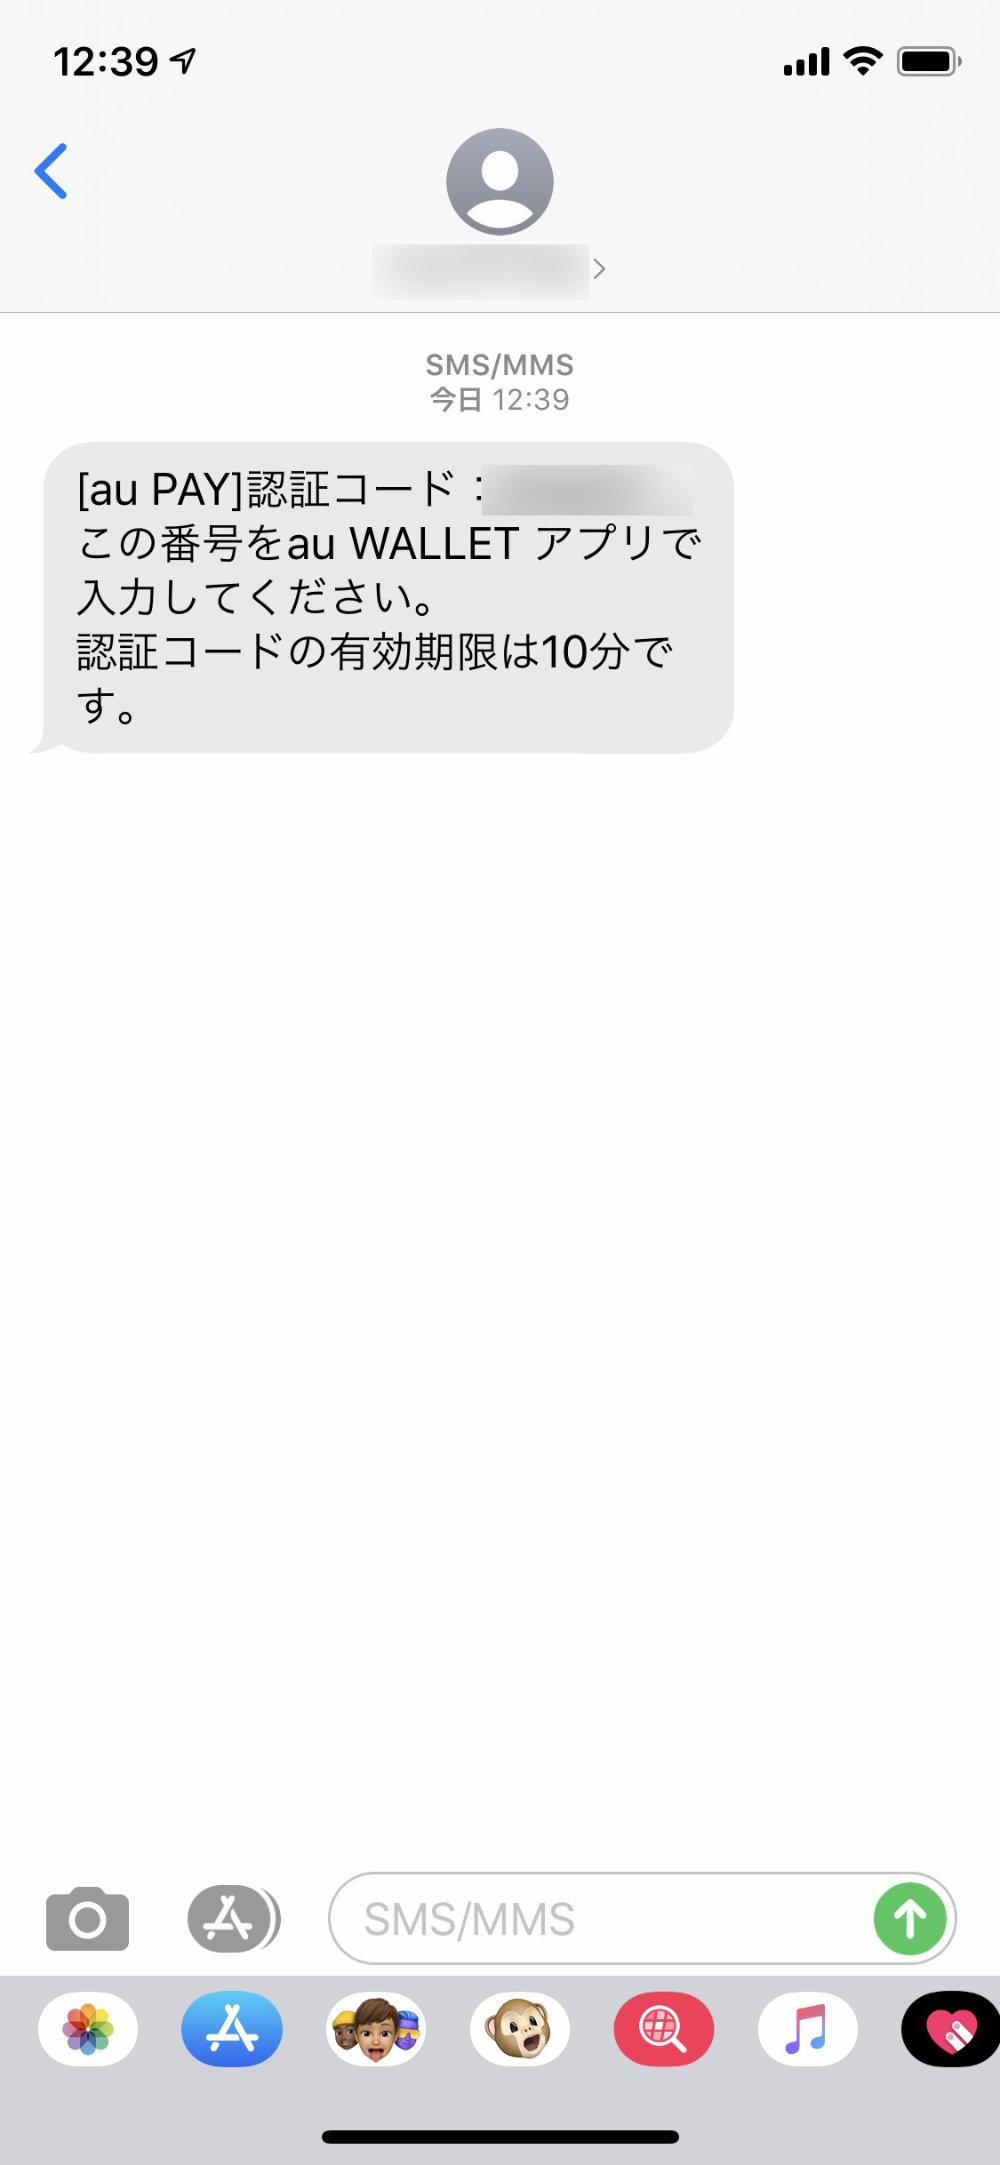 SMSに届いた認証コードを確認